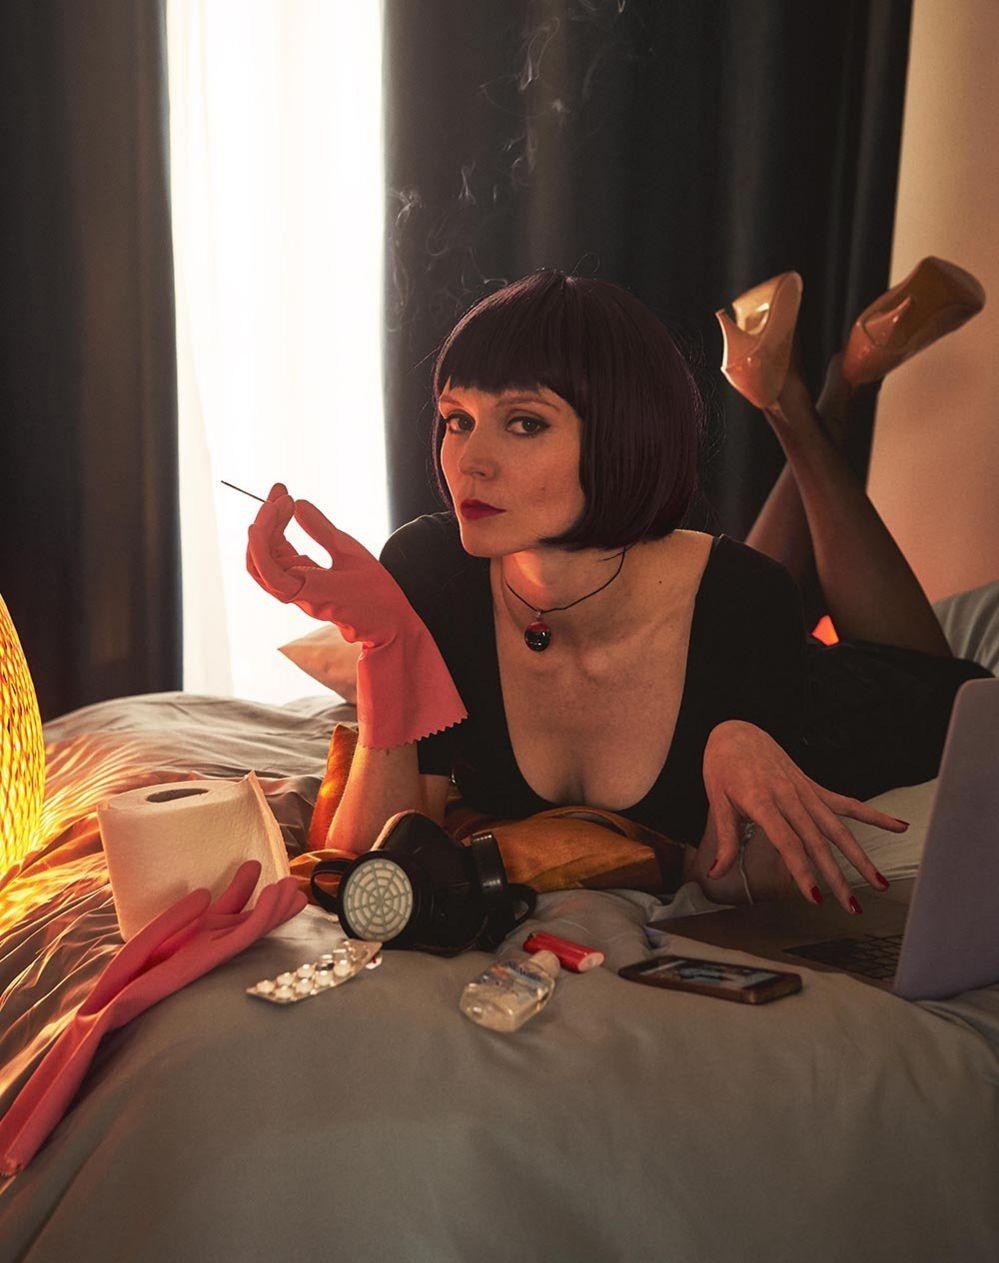 Julia Keil in a scene from Pulp Fiction